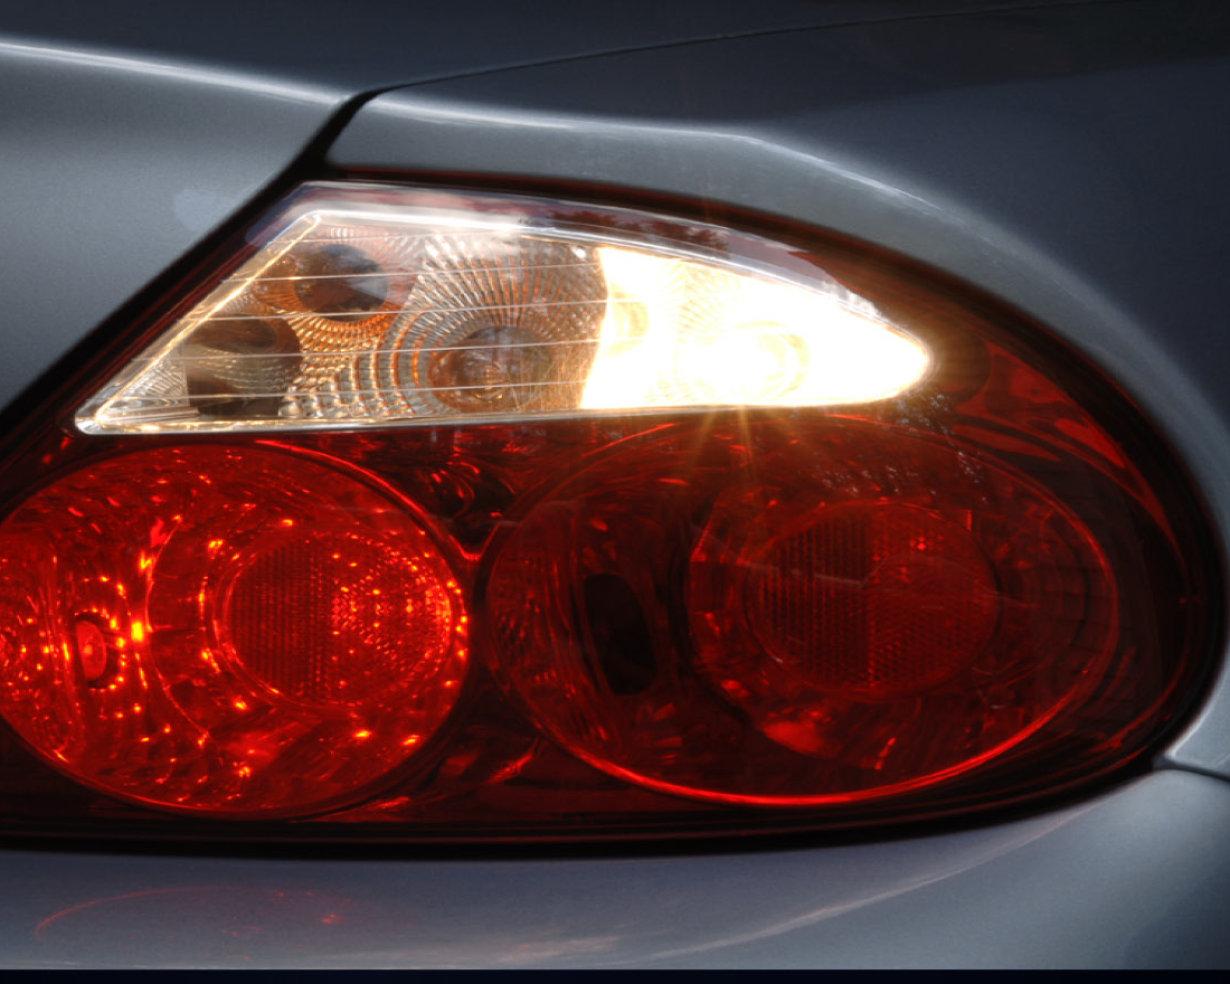 Sylvania Automotive Bulb Guide >> Silverstar Mini Bulbs Whiter Light Premium Incandescent